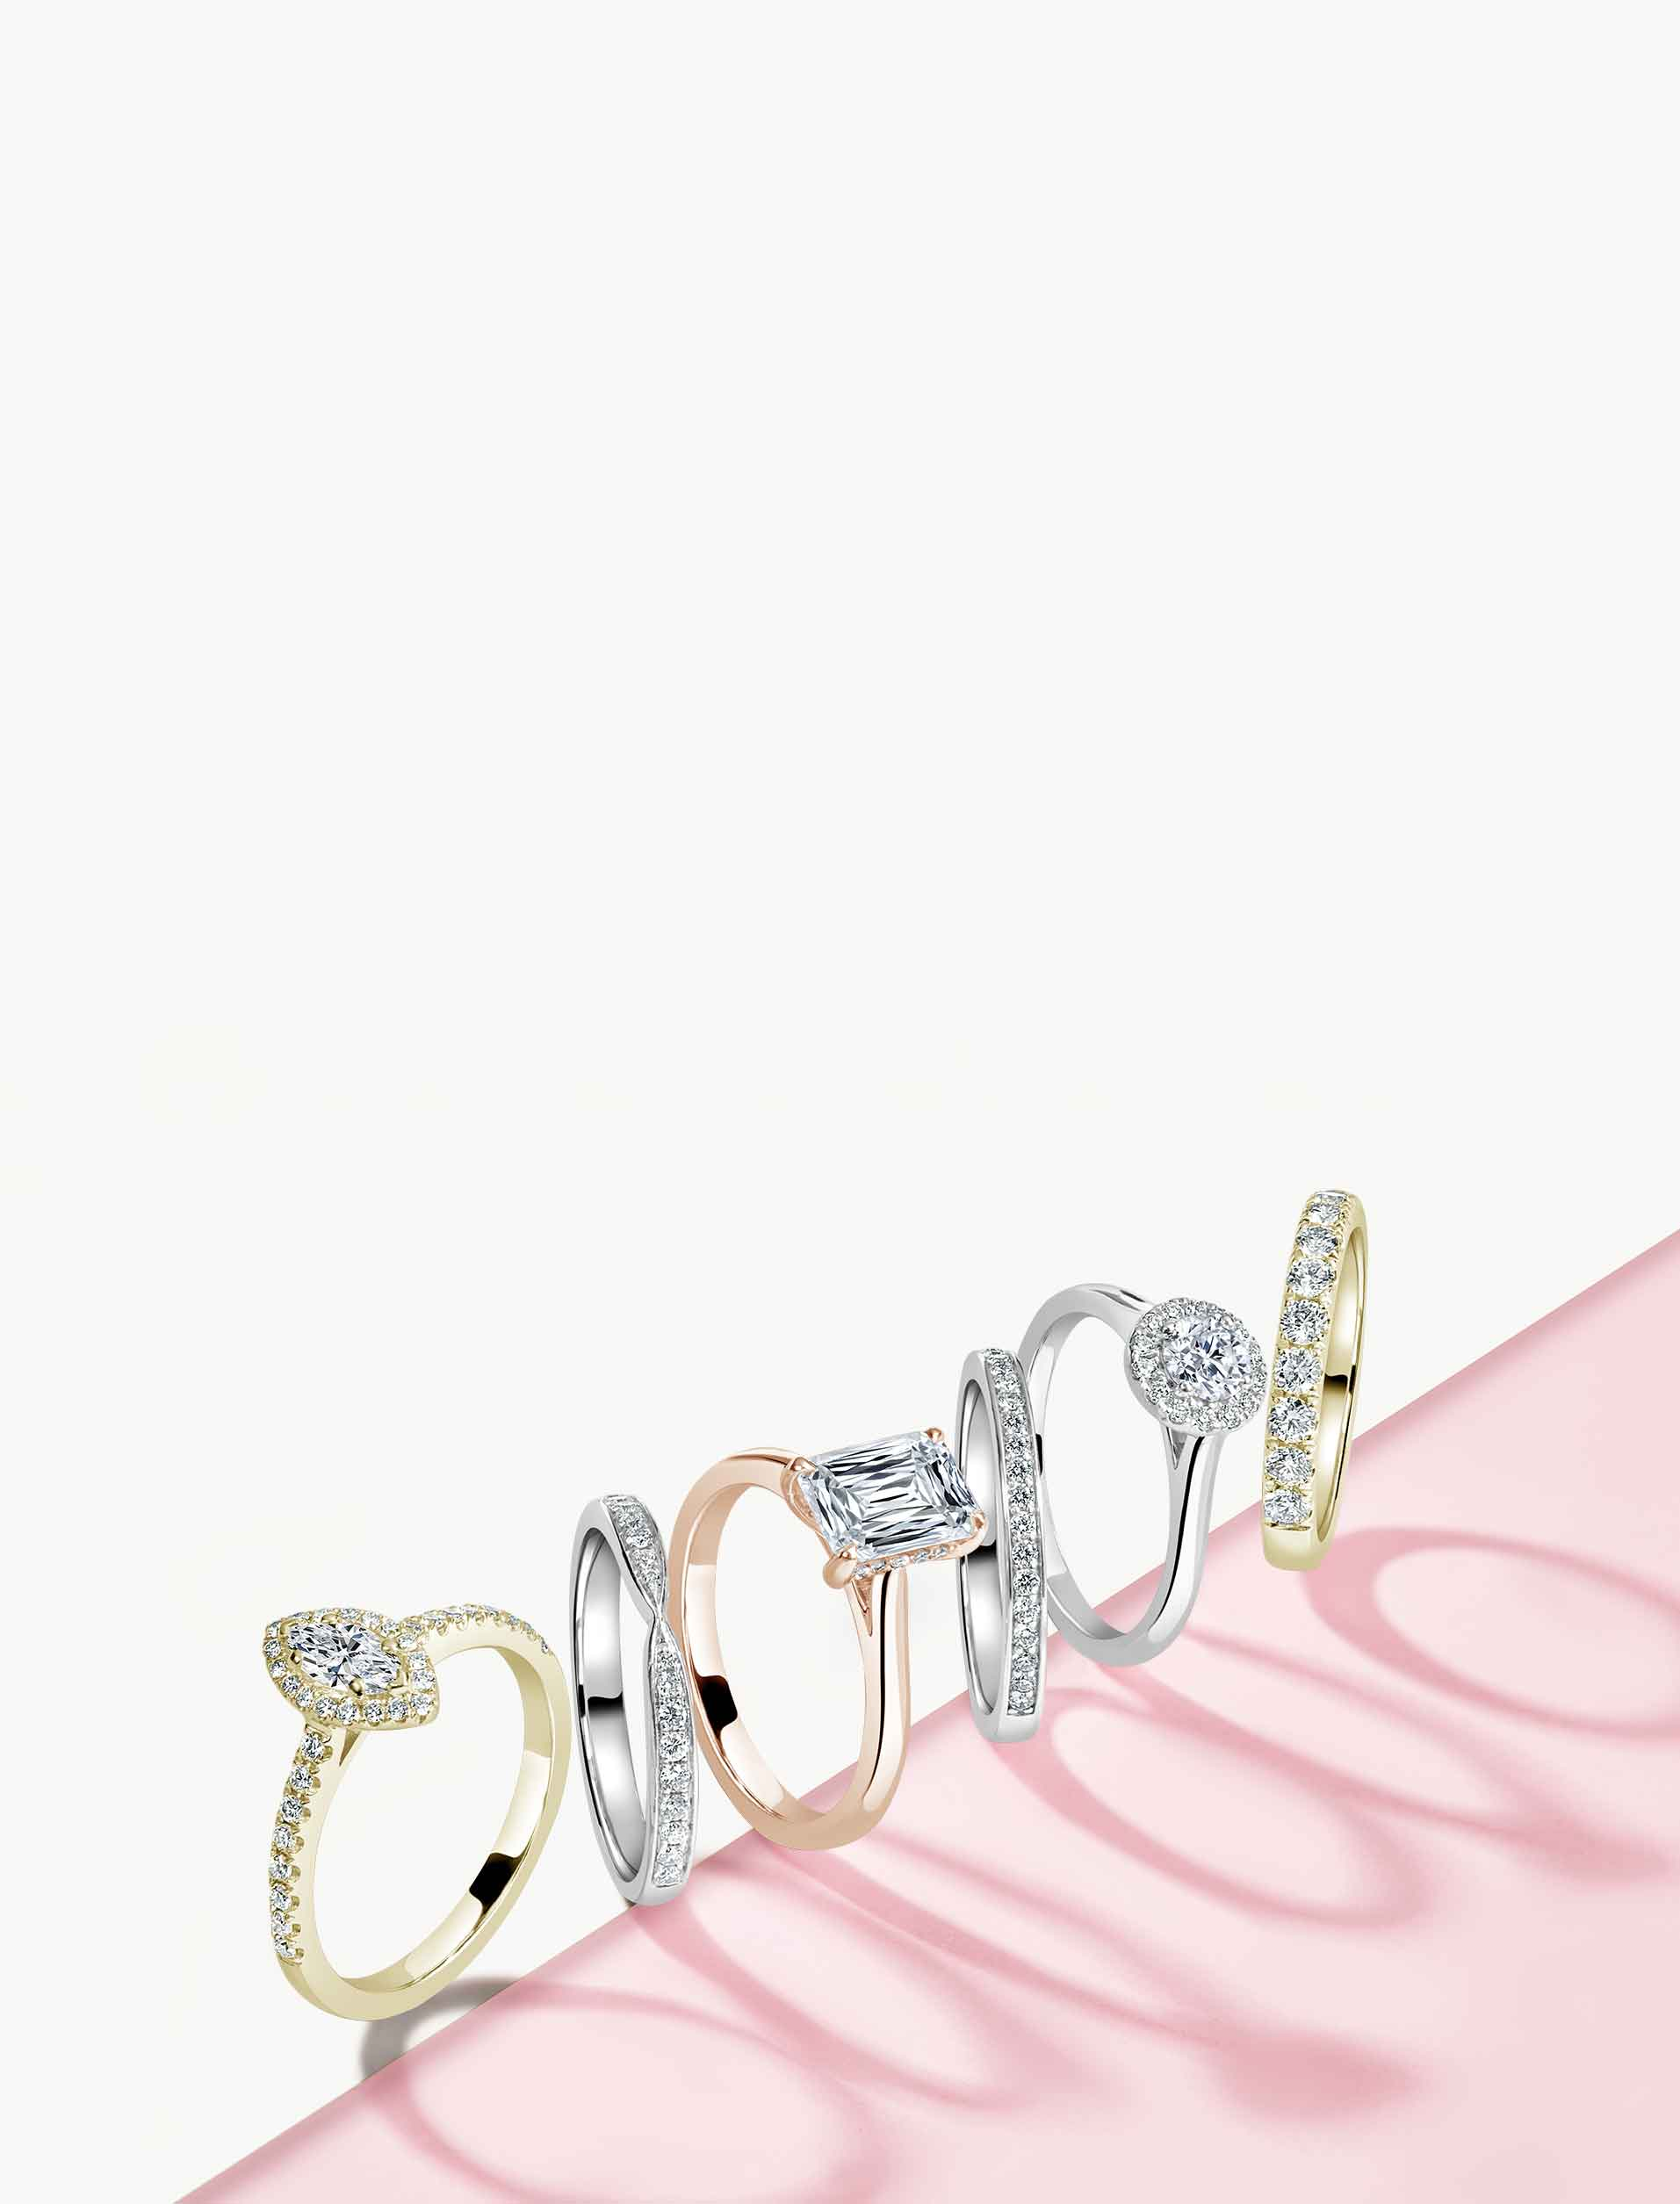 Radiant Cut Three Stone Engagement Rings